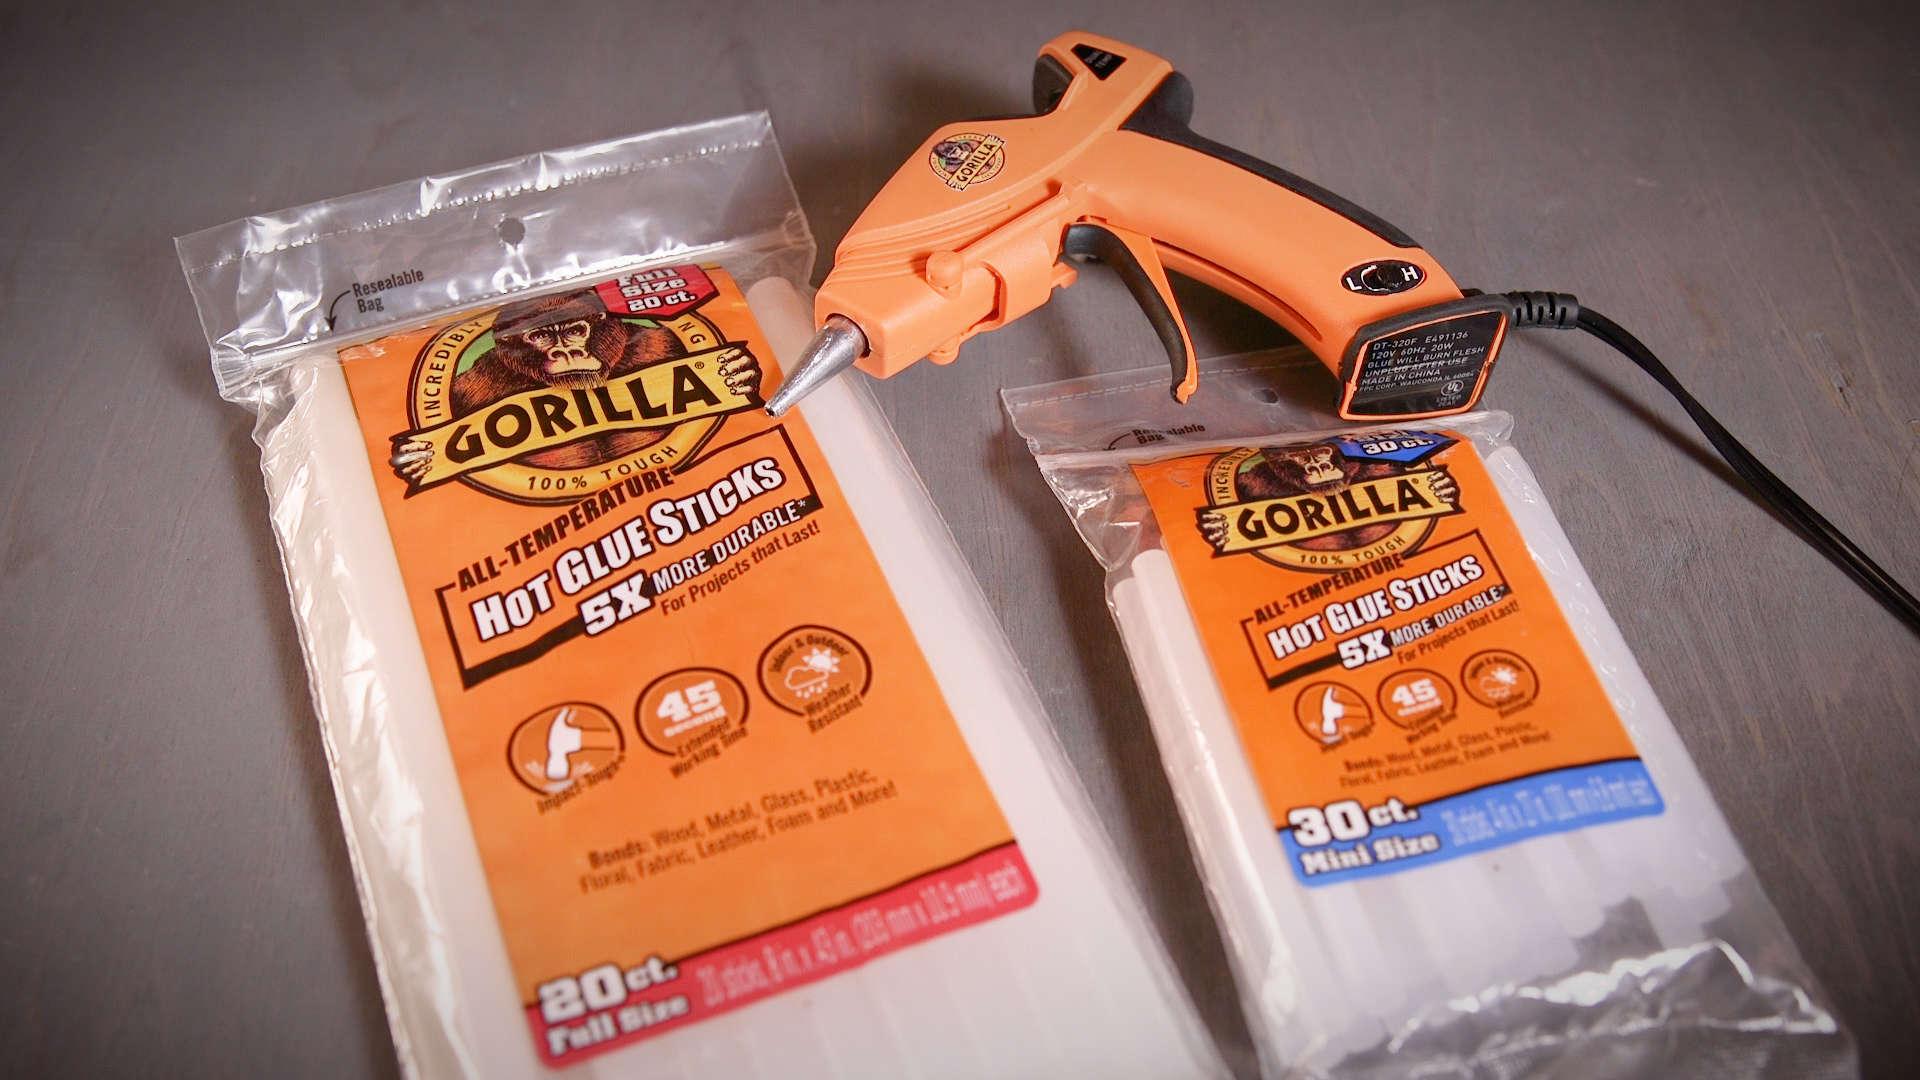 Gorilla Hot Glue Sticks | Gorilla Glue | Gorilla Glue